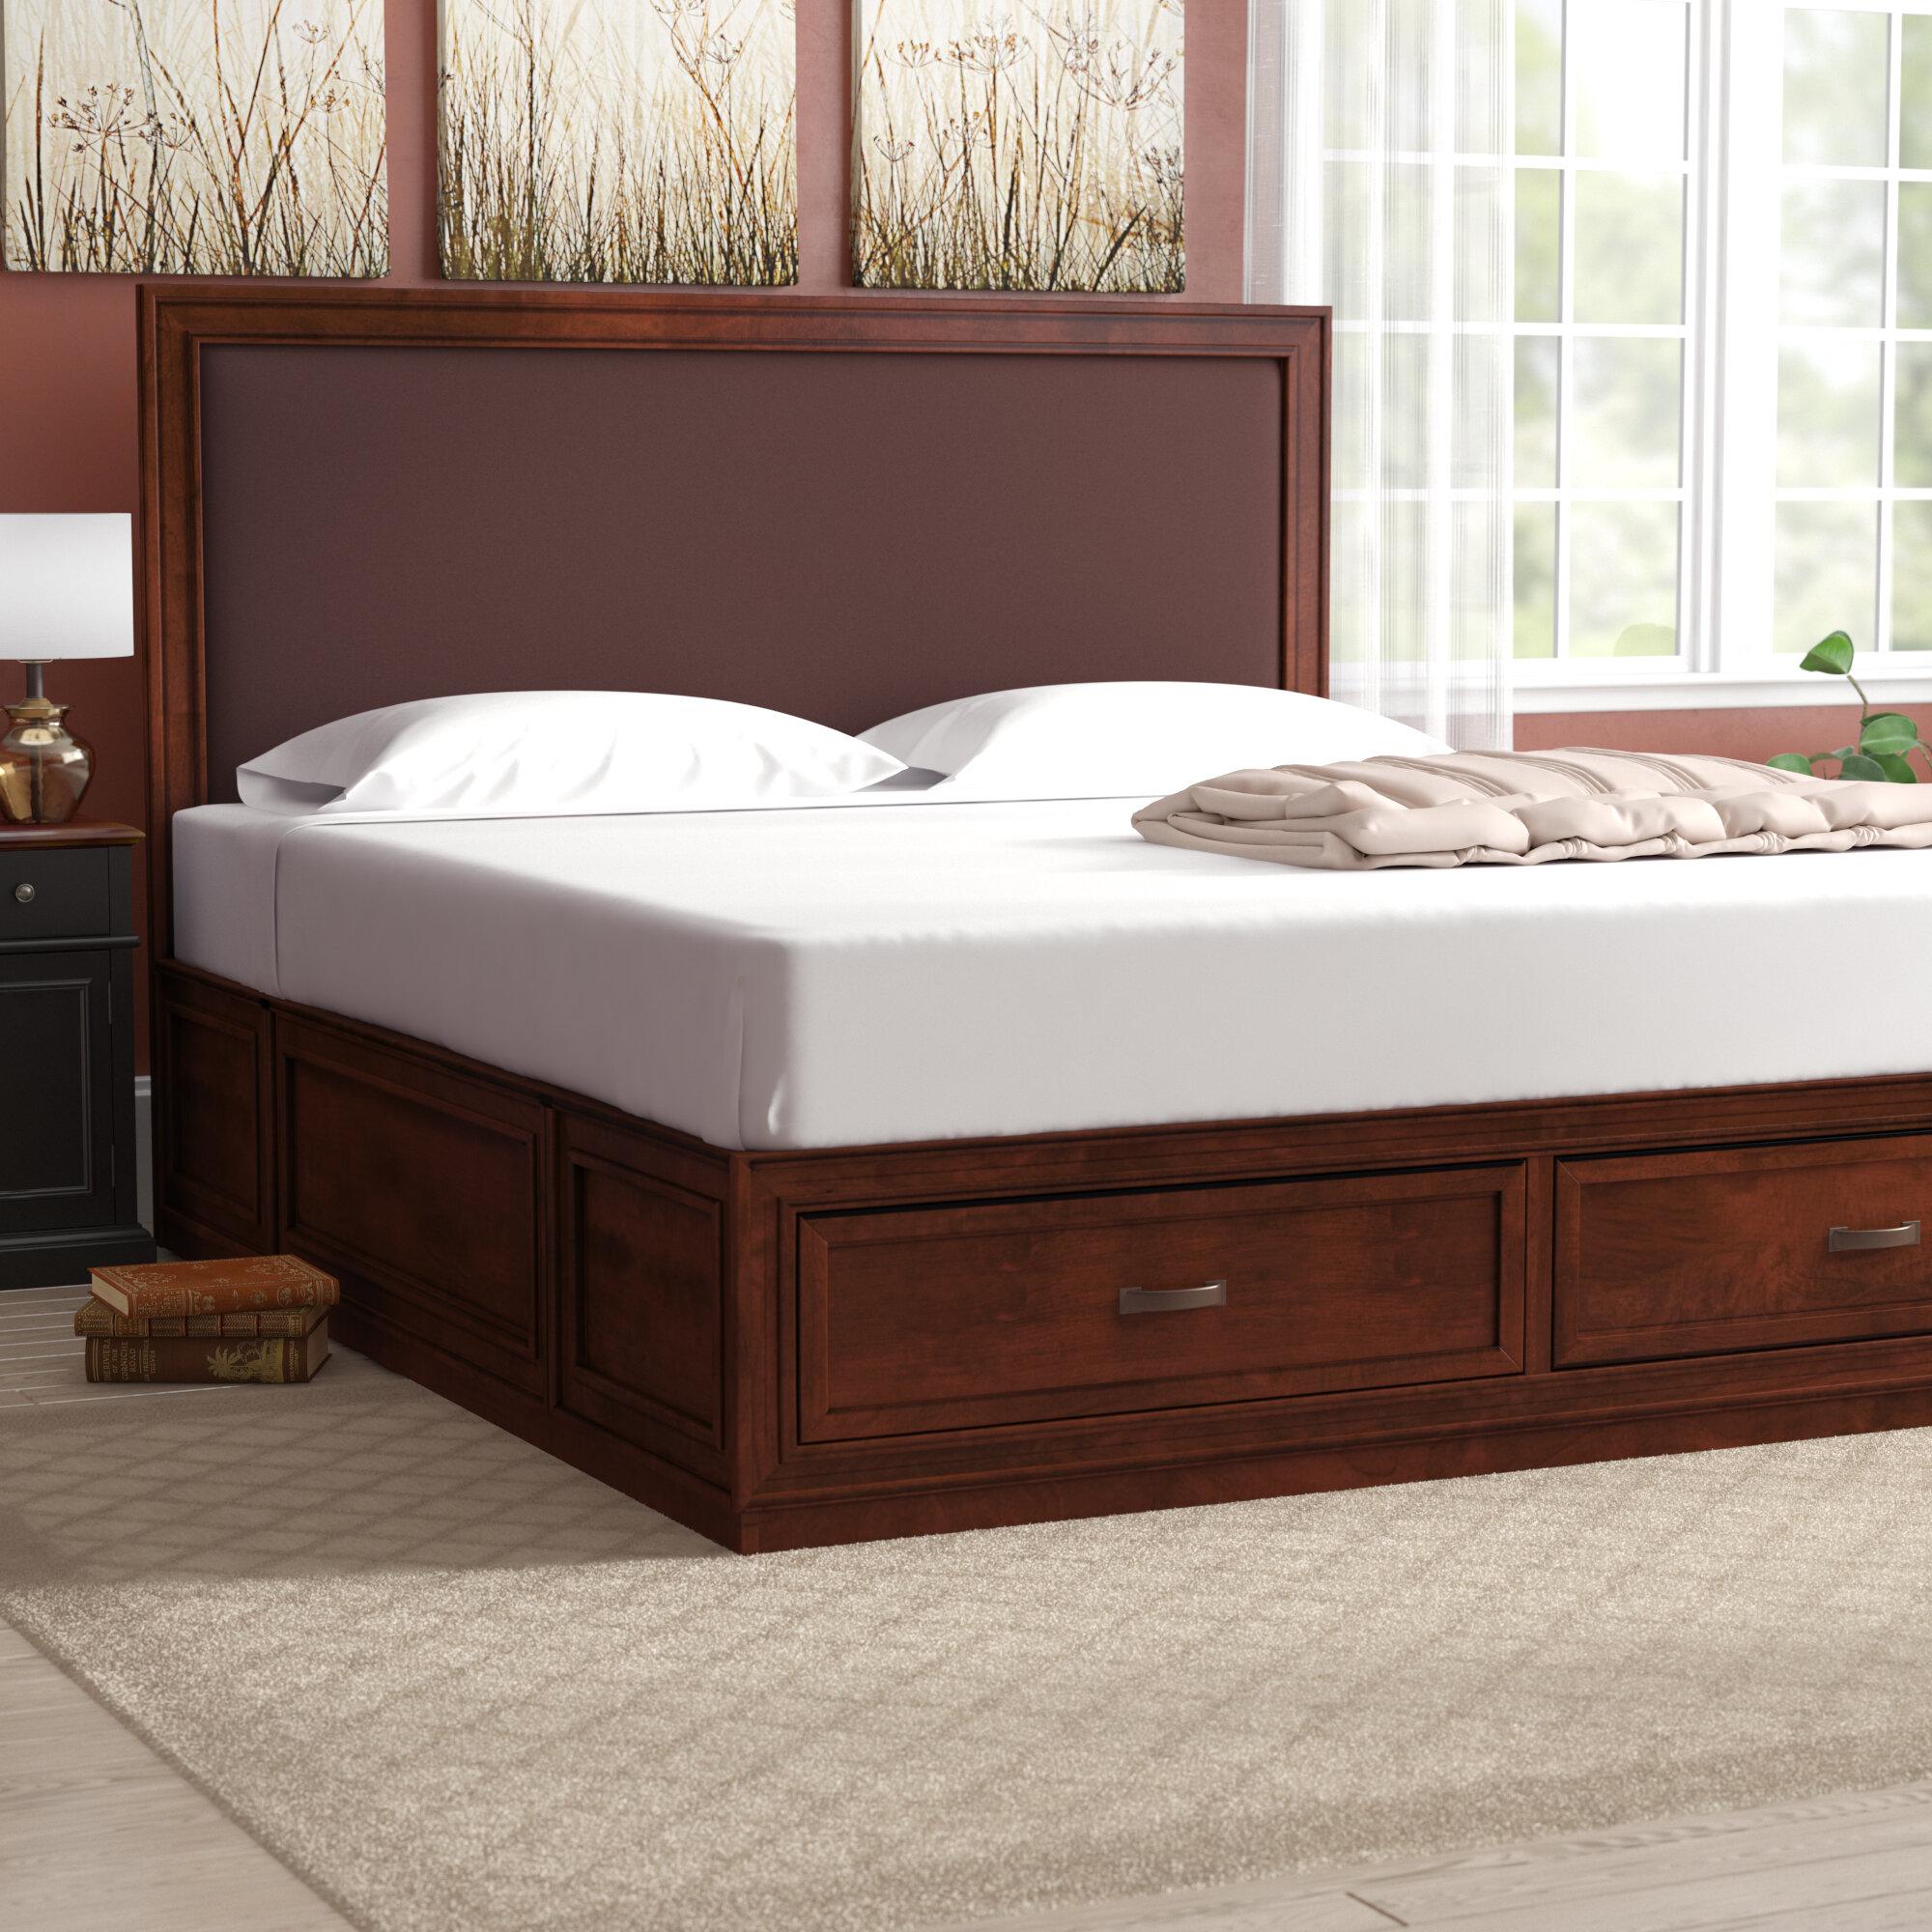 king platform bed with storage